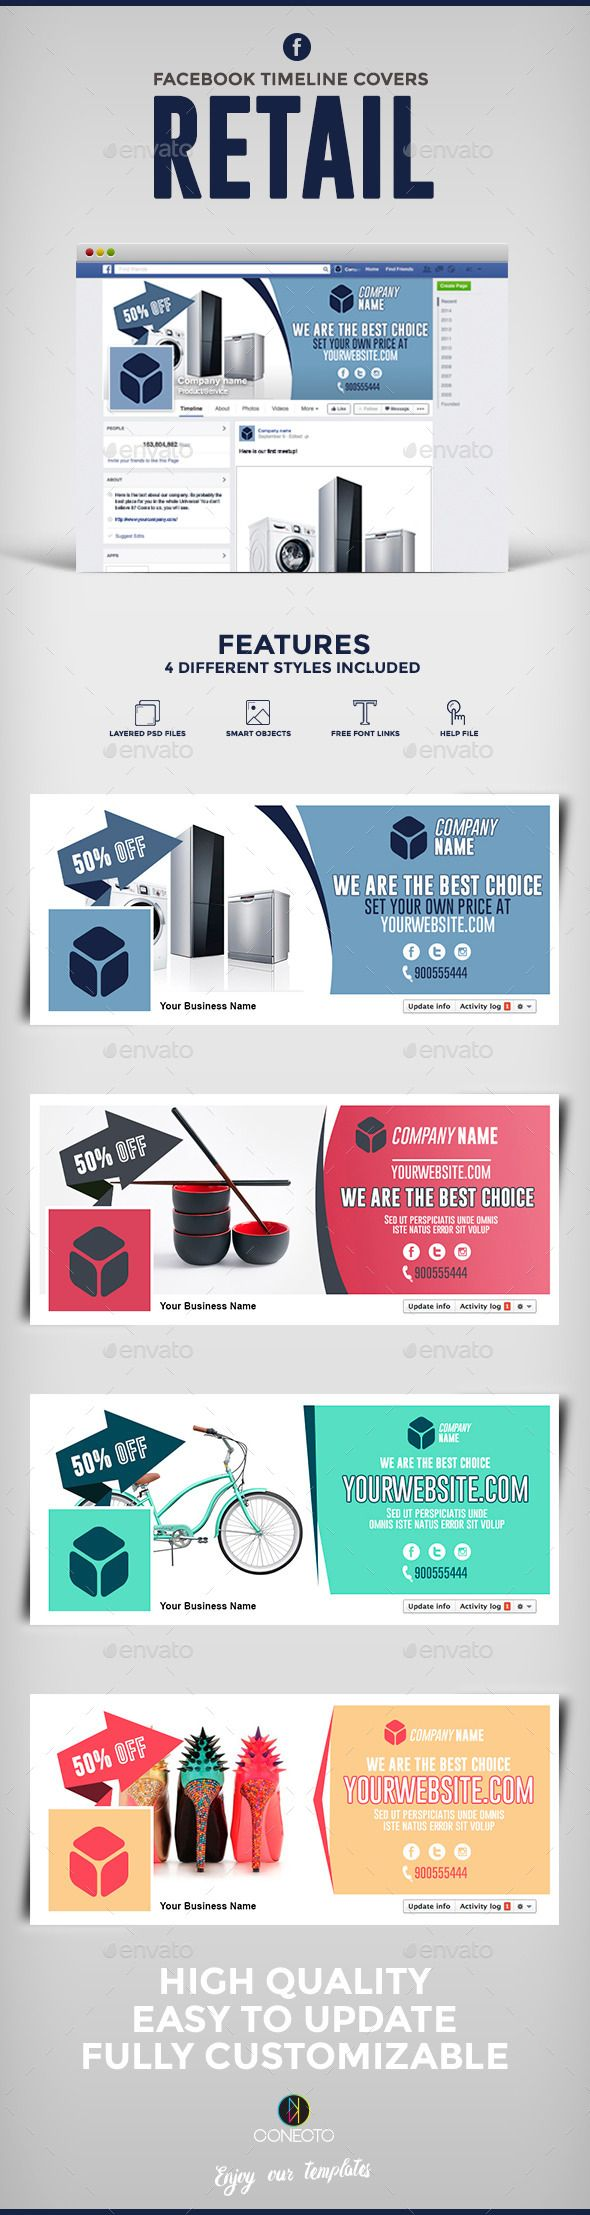 Facebook Timeline Covers Retail Template #design Download: http://graphicriver.net/item/facebook-timeline-covers-retail/12322344?ref=ksioks